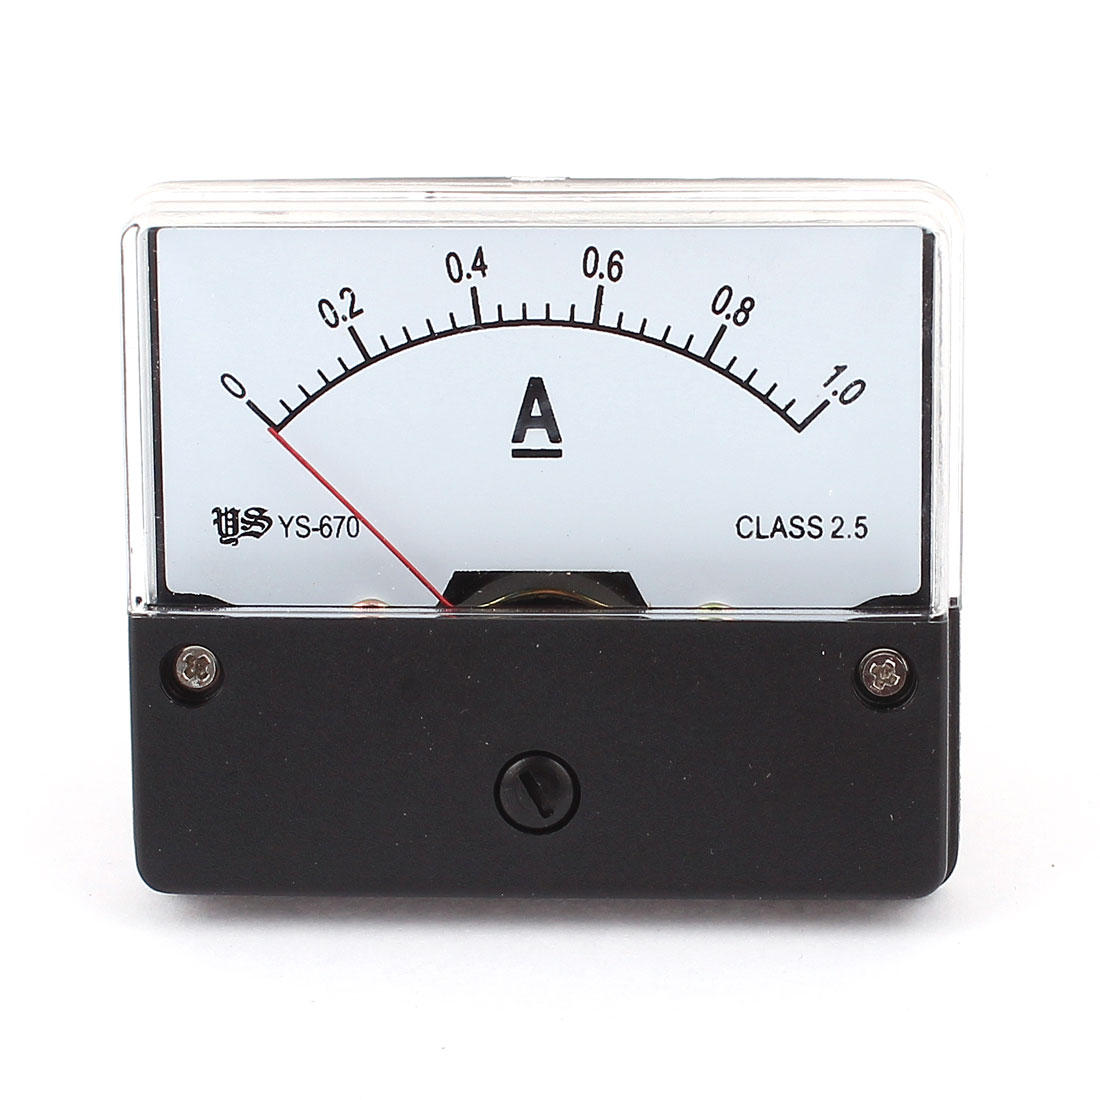 Unique Bargains DC 0-1A 1A Panel Analog Ammeter Current Meter Gauge White YS-670